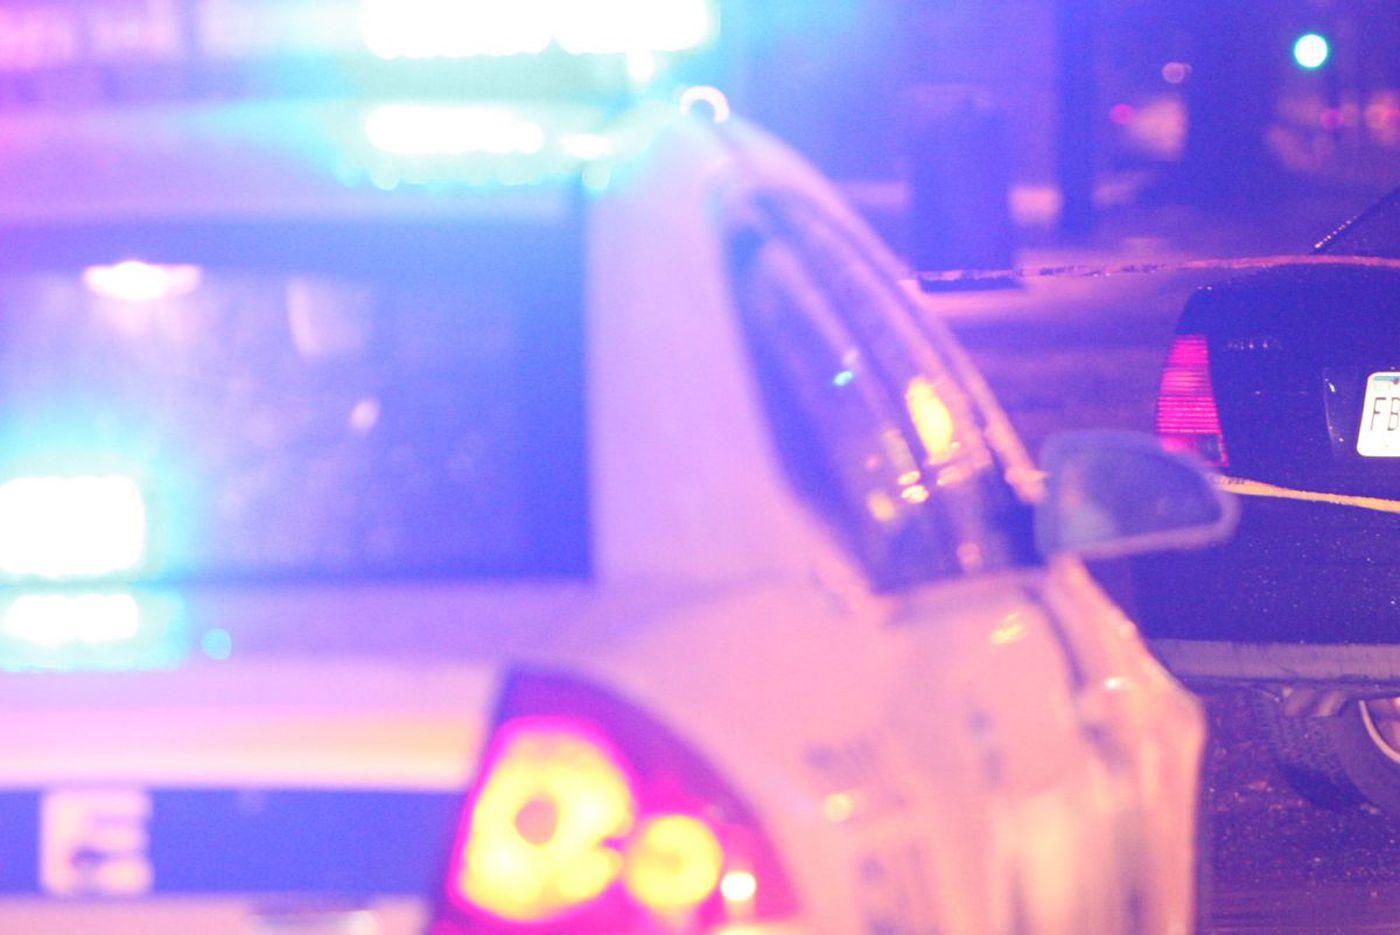 Police release video of Bensalem bar brawl that left employee injured